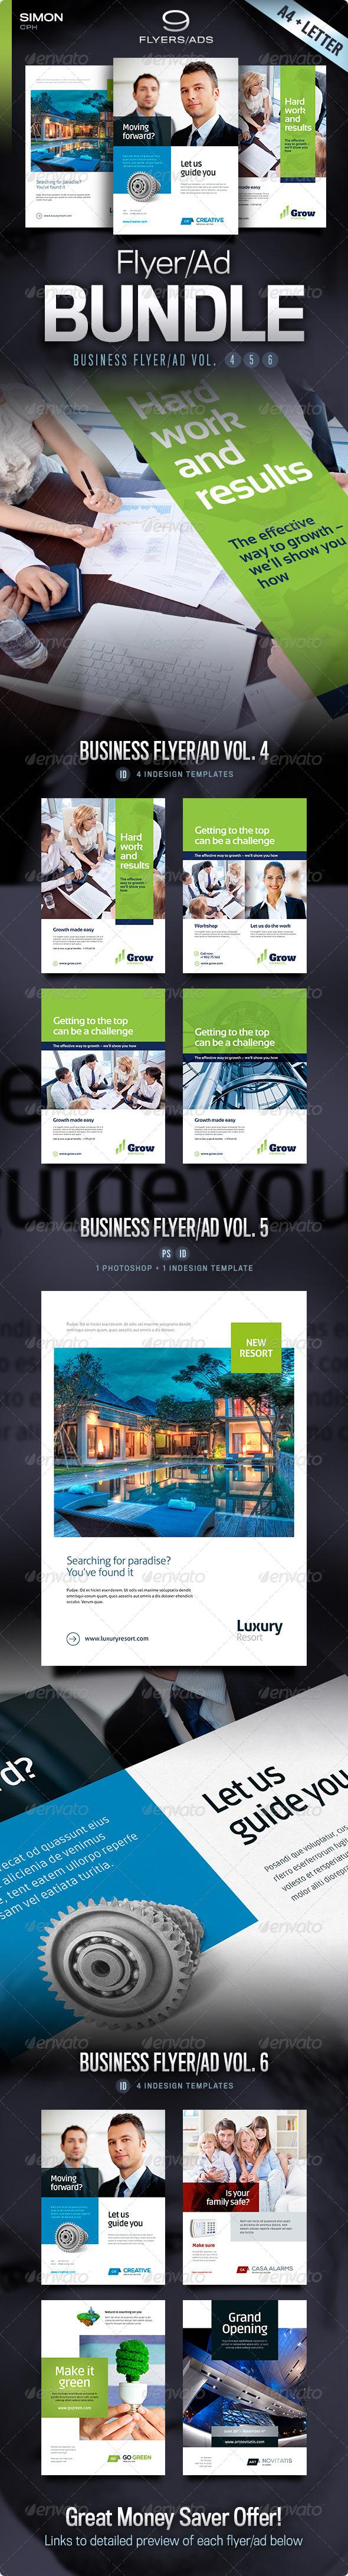 GraphicRiver Business Flyer Ad Bundle Vol 4-5-6 4644126